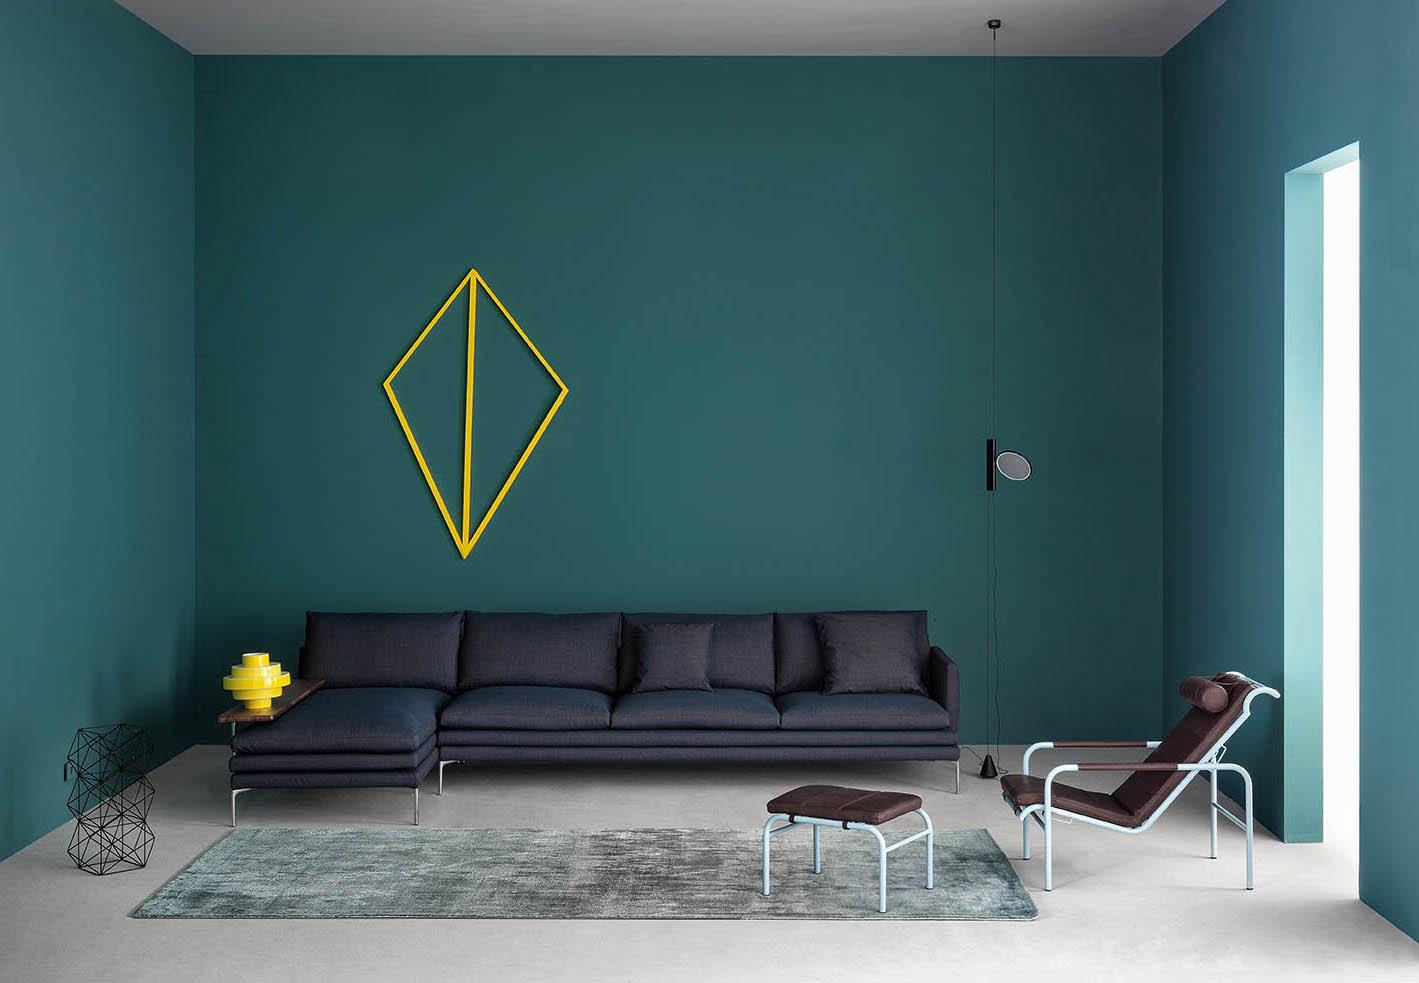 Zanotta sofa and lounge chairs from Salone 2015